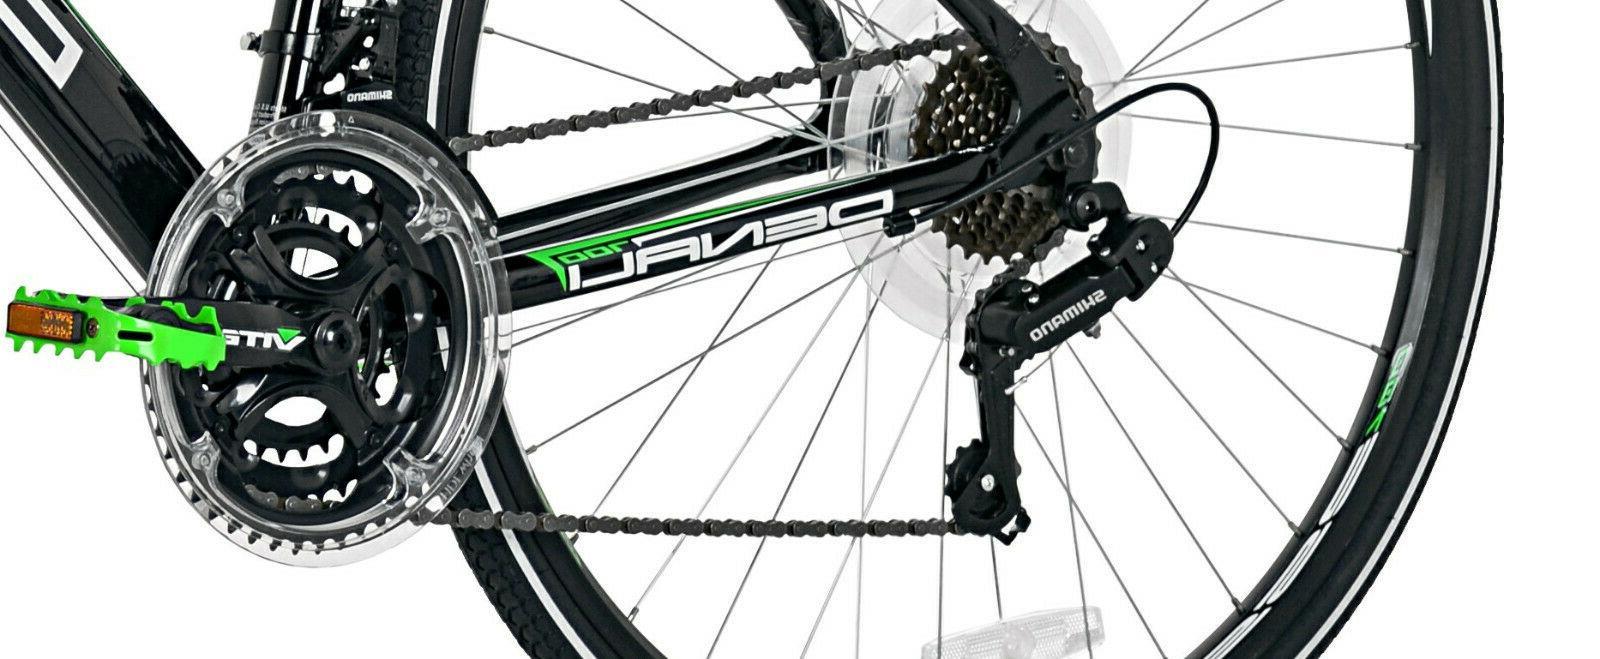 GMC Aluminum Adult Road Bike Black Green Speed Shimano